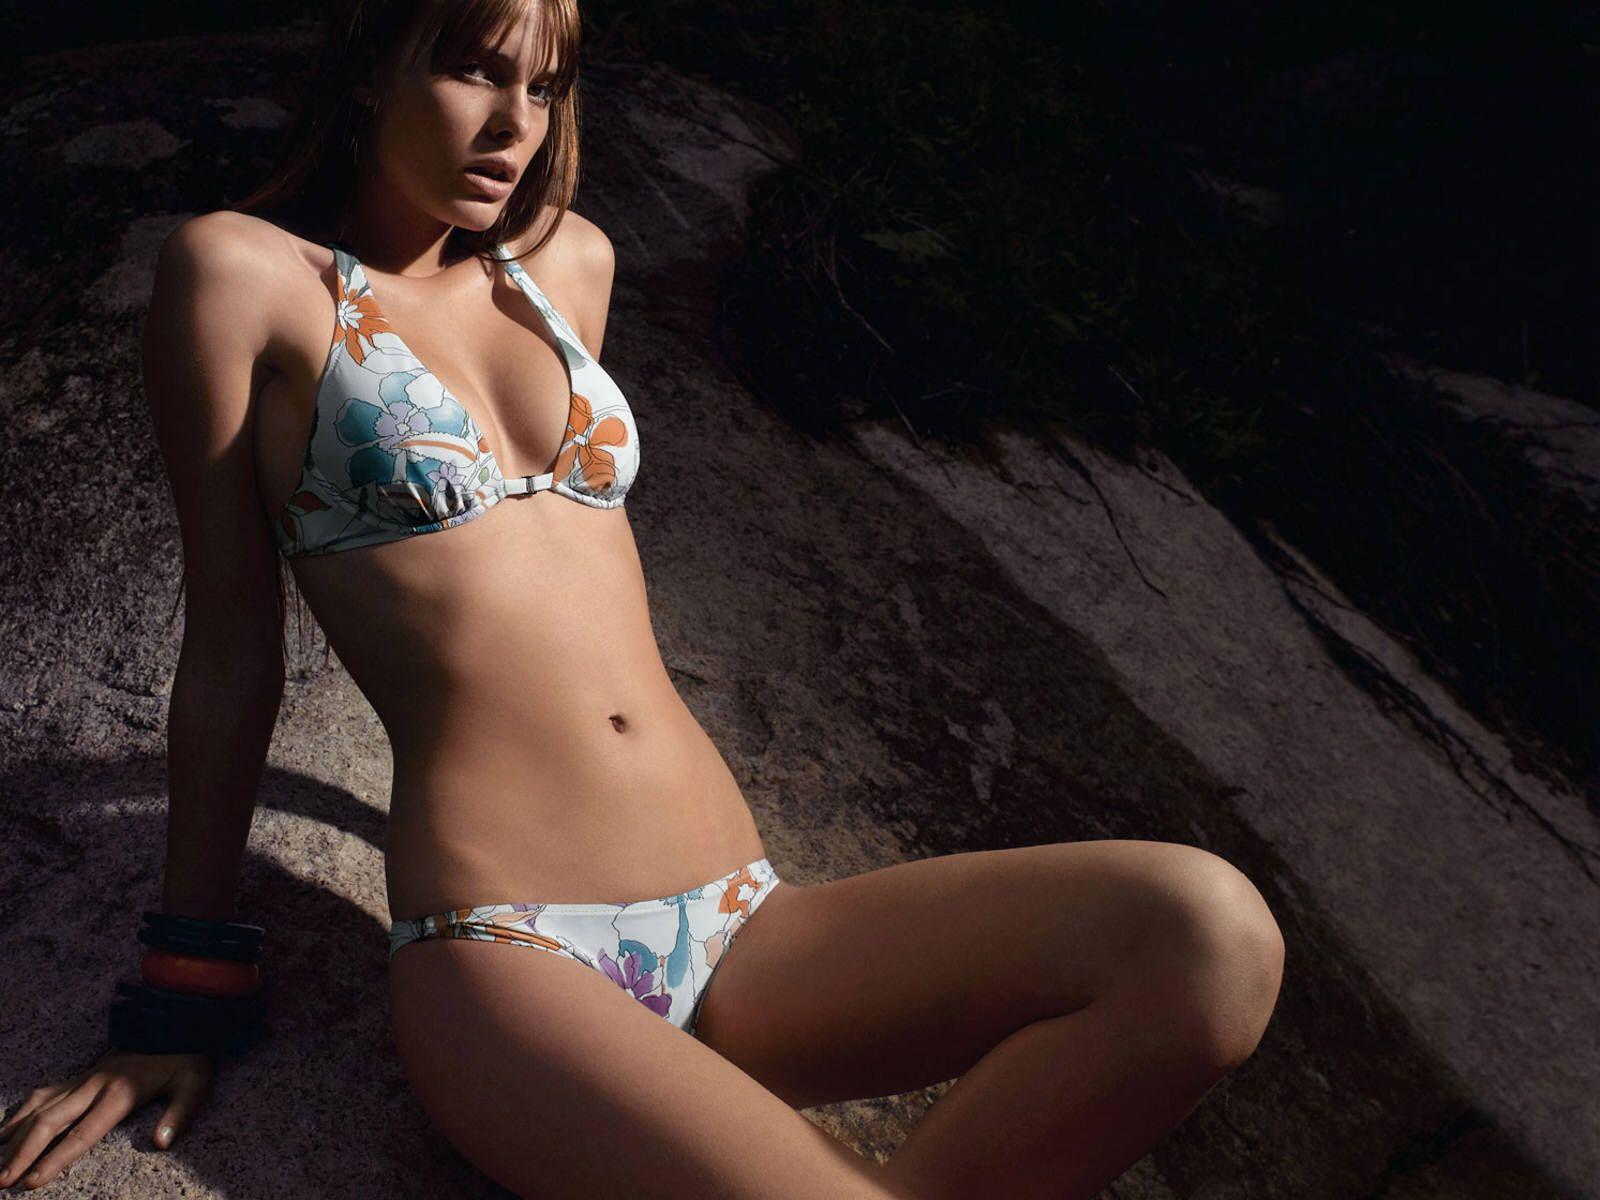 Девочки юного возраста порно фото